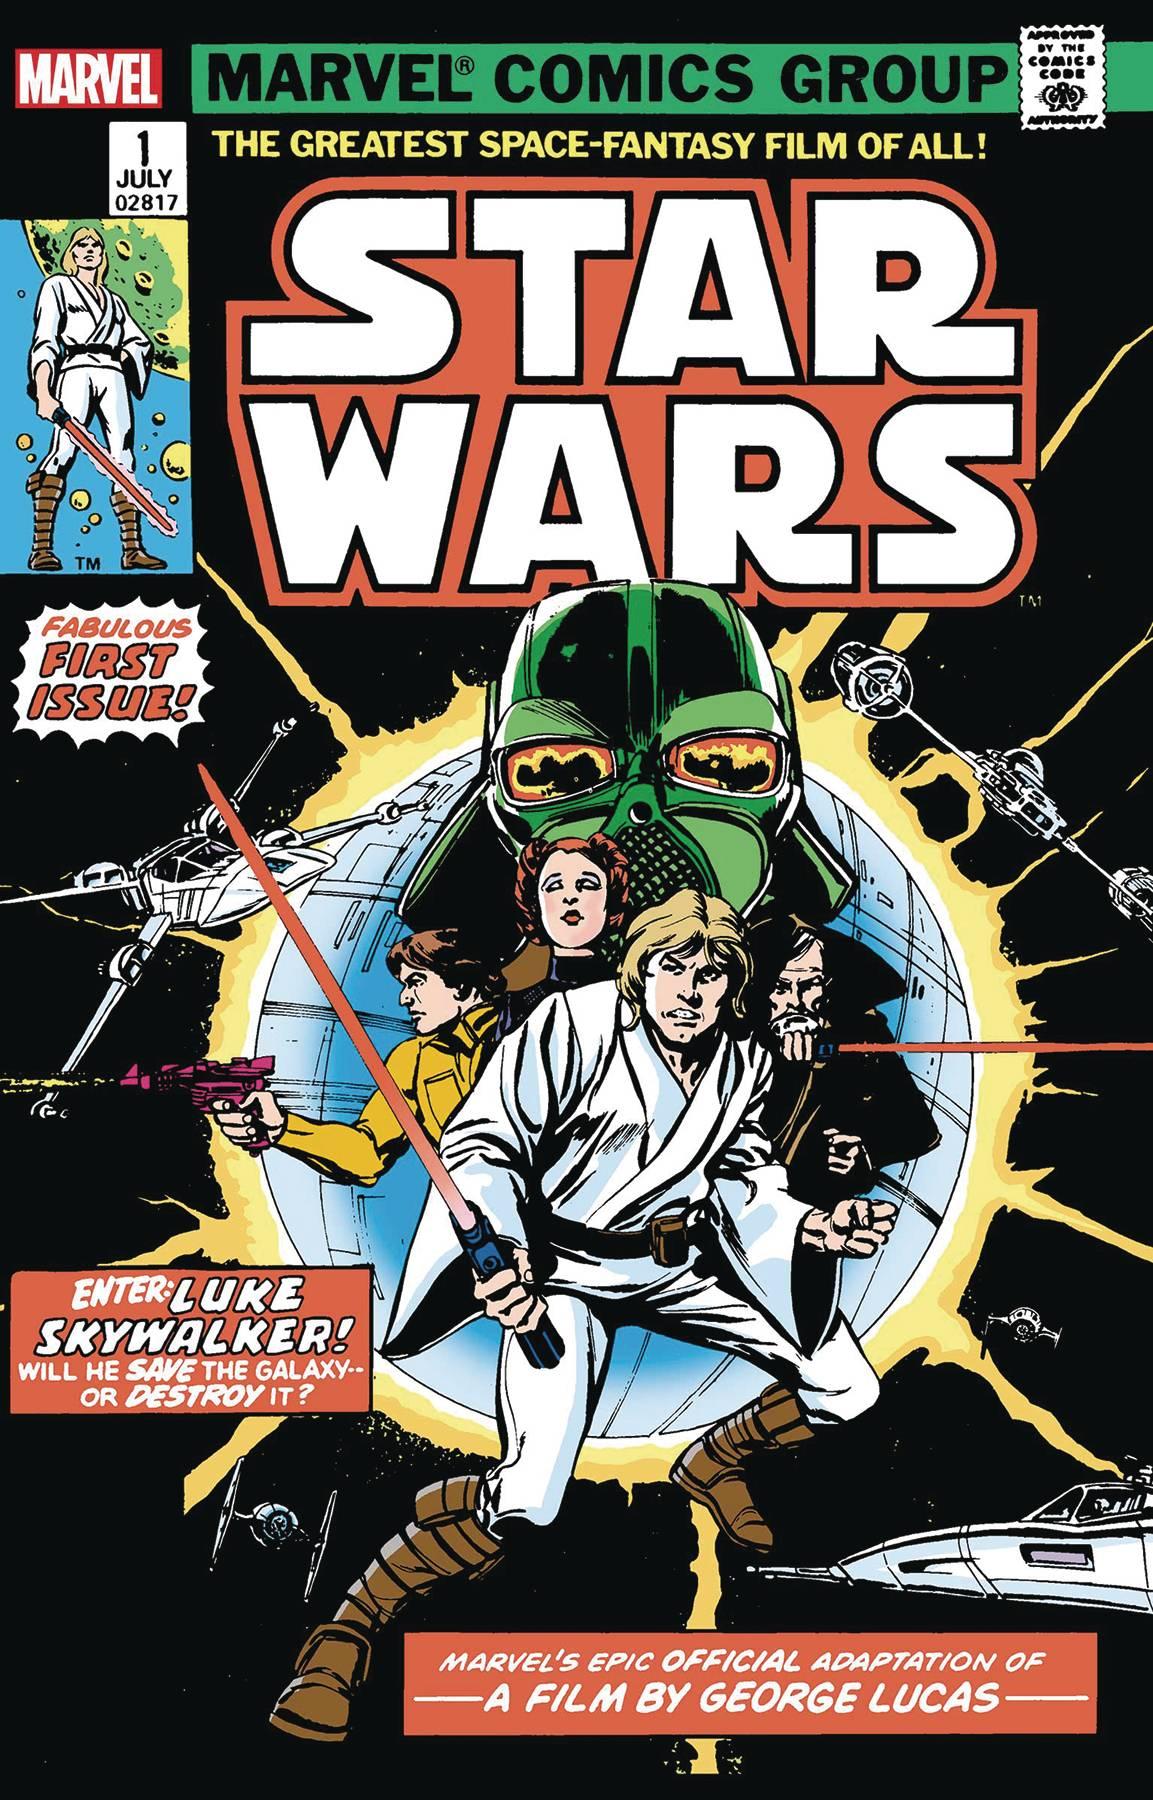 Star Wars (1977) #1 Facsimile Edition